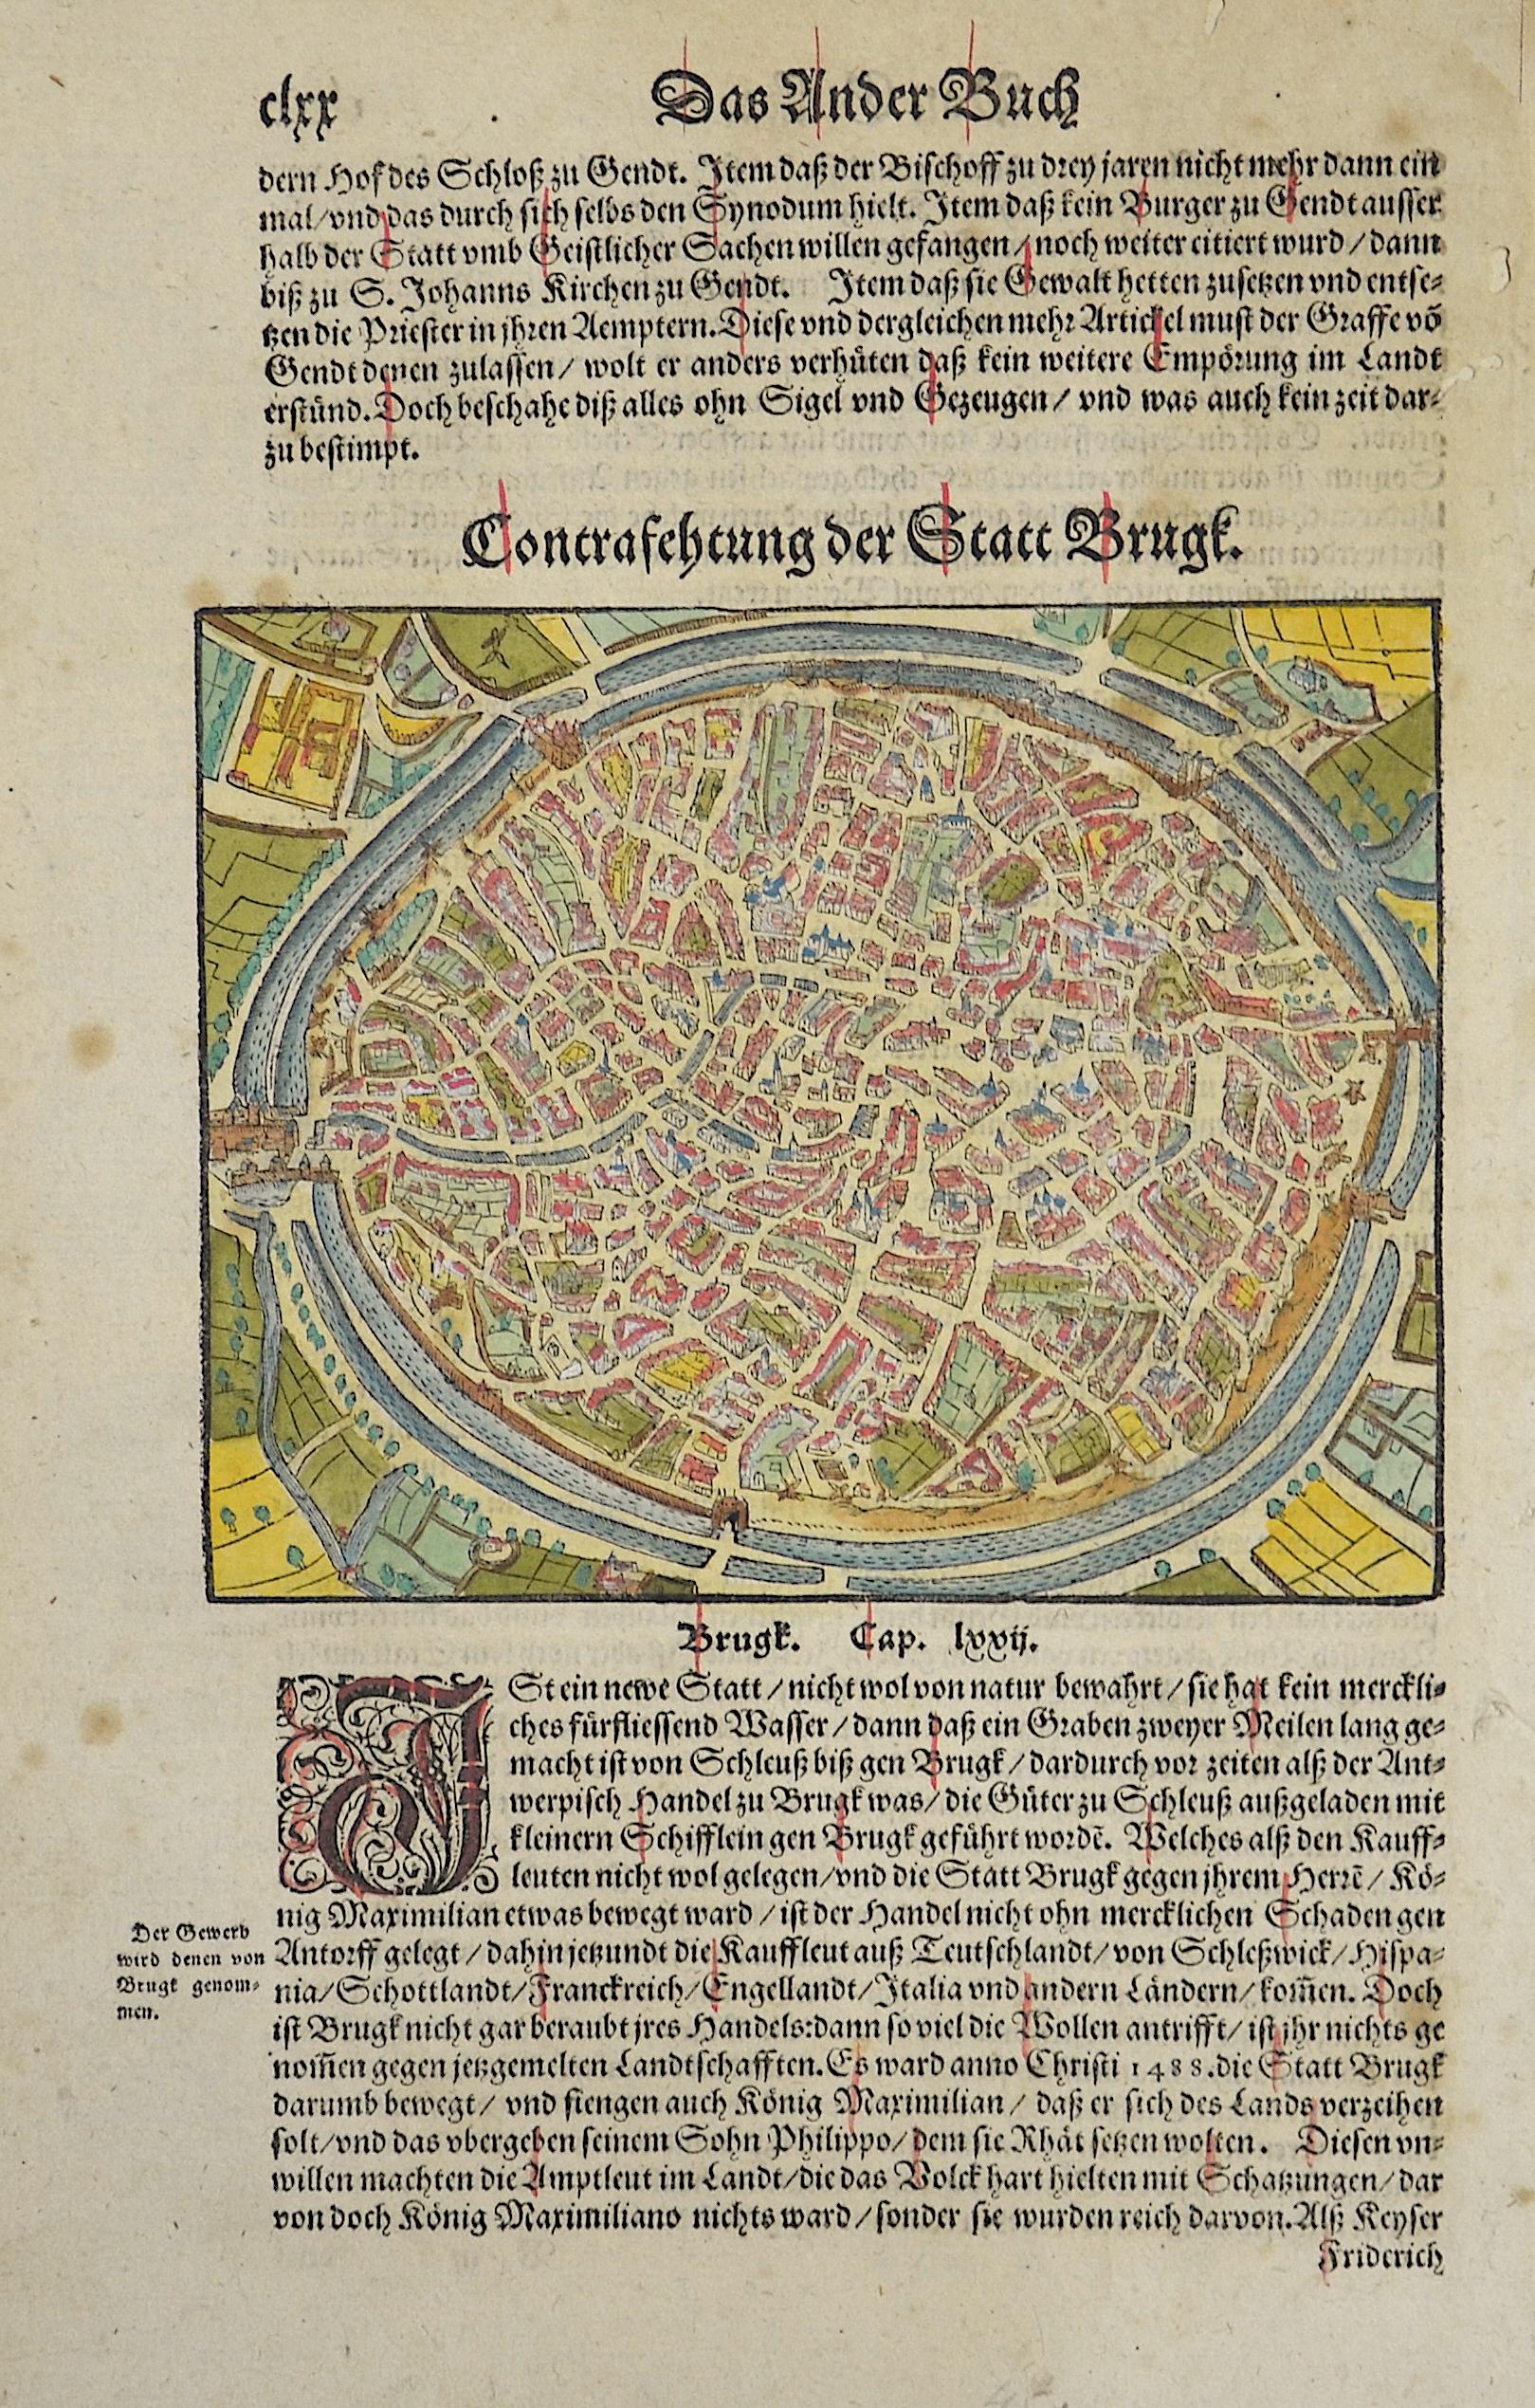 Münster Sebastian Contrafehtung der Statt Brugk.